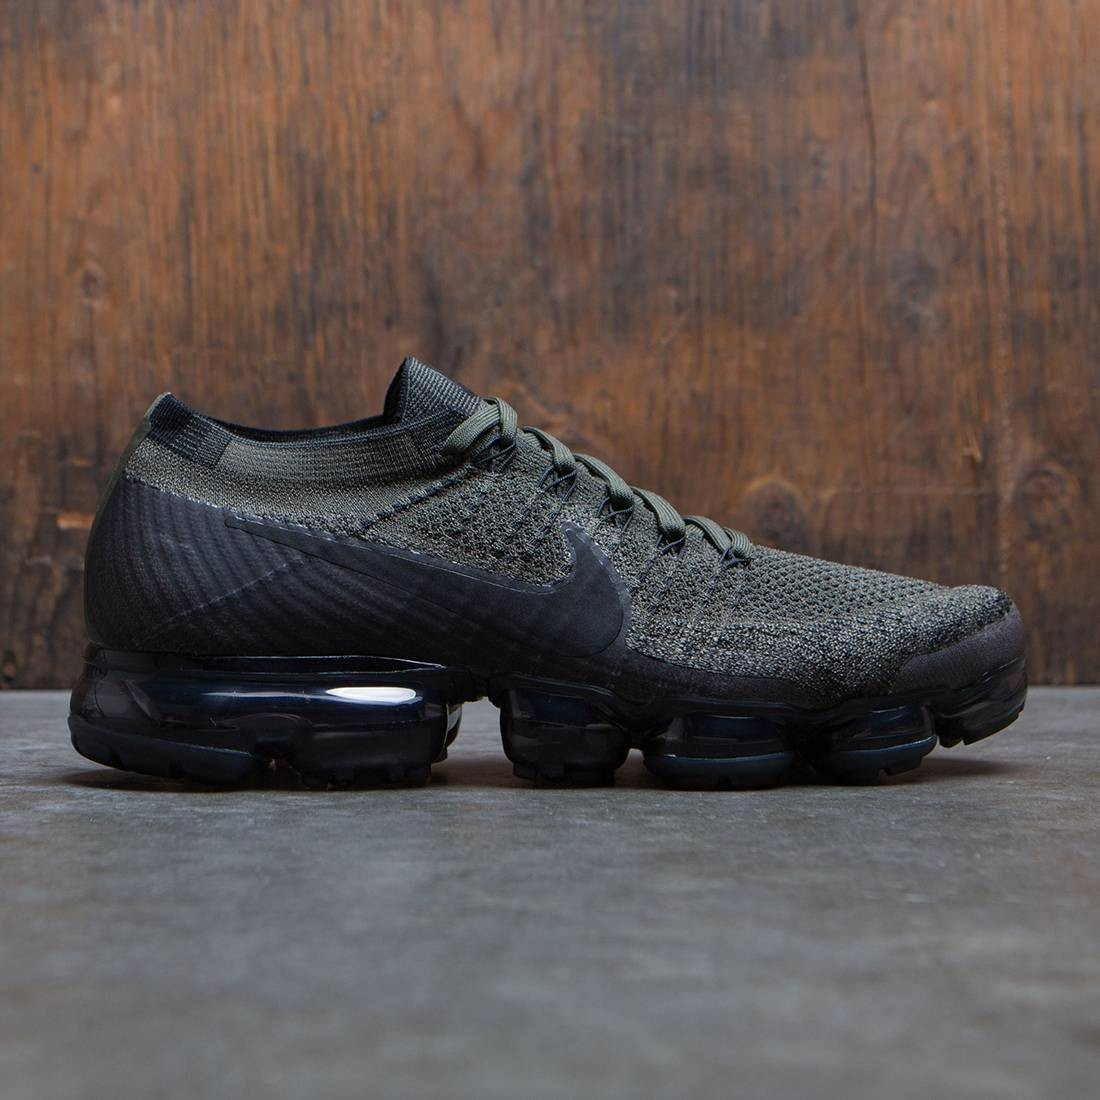 497120669fe92 Nike Vapormax Black And Grey biological-crop-protection.co.uk